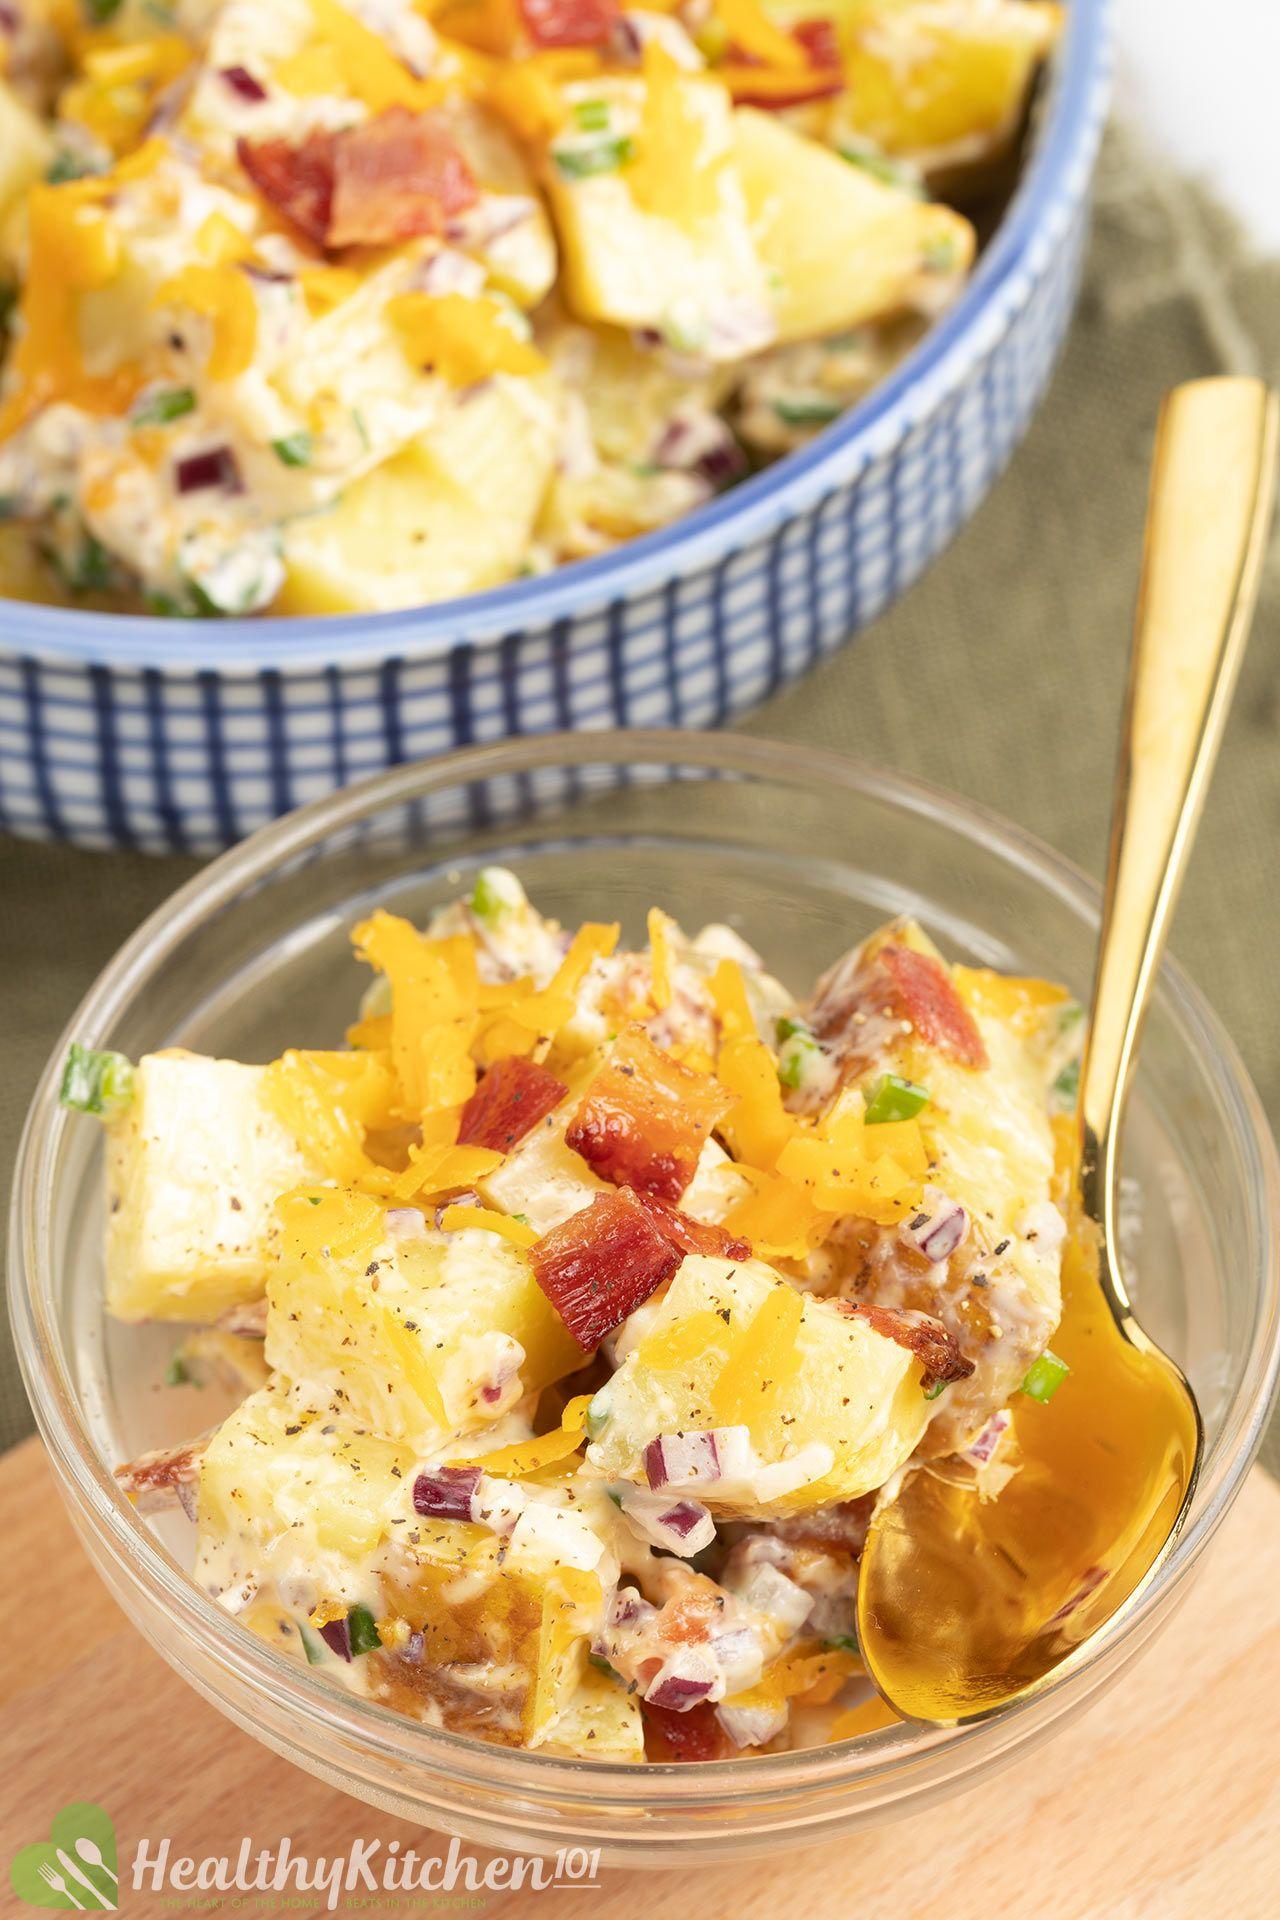 Best Potatoes for Potato Salad